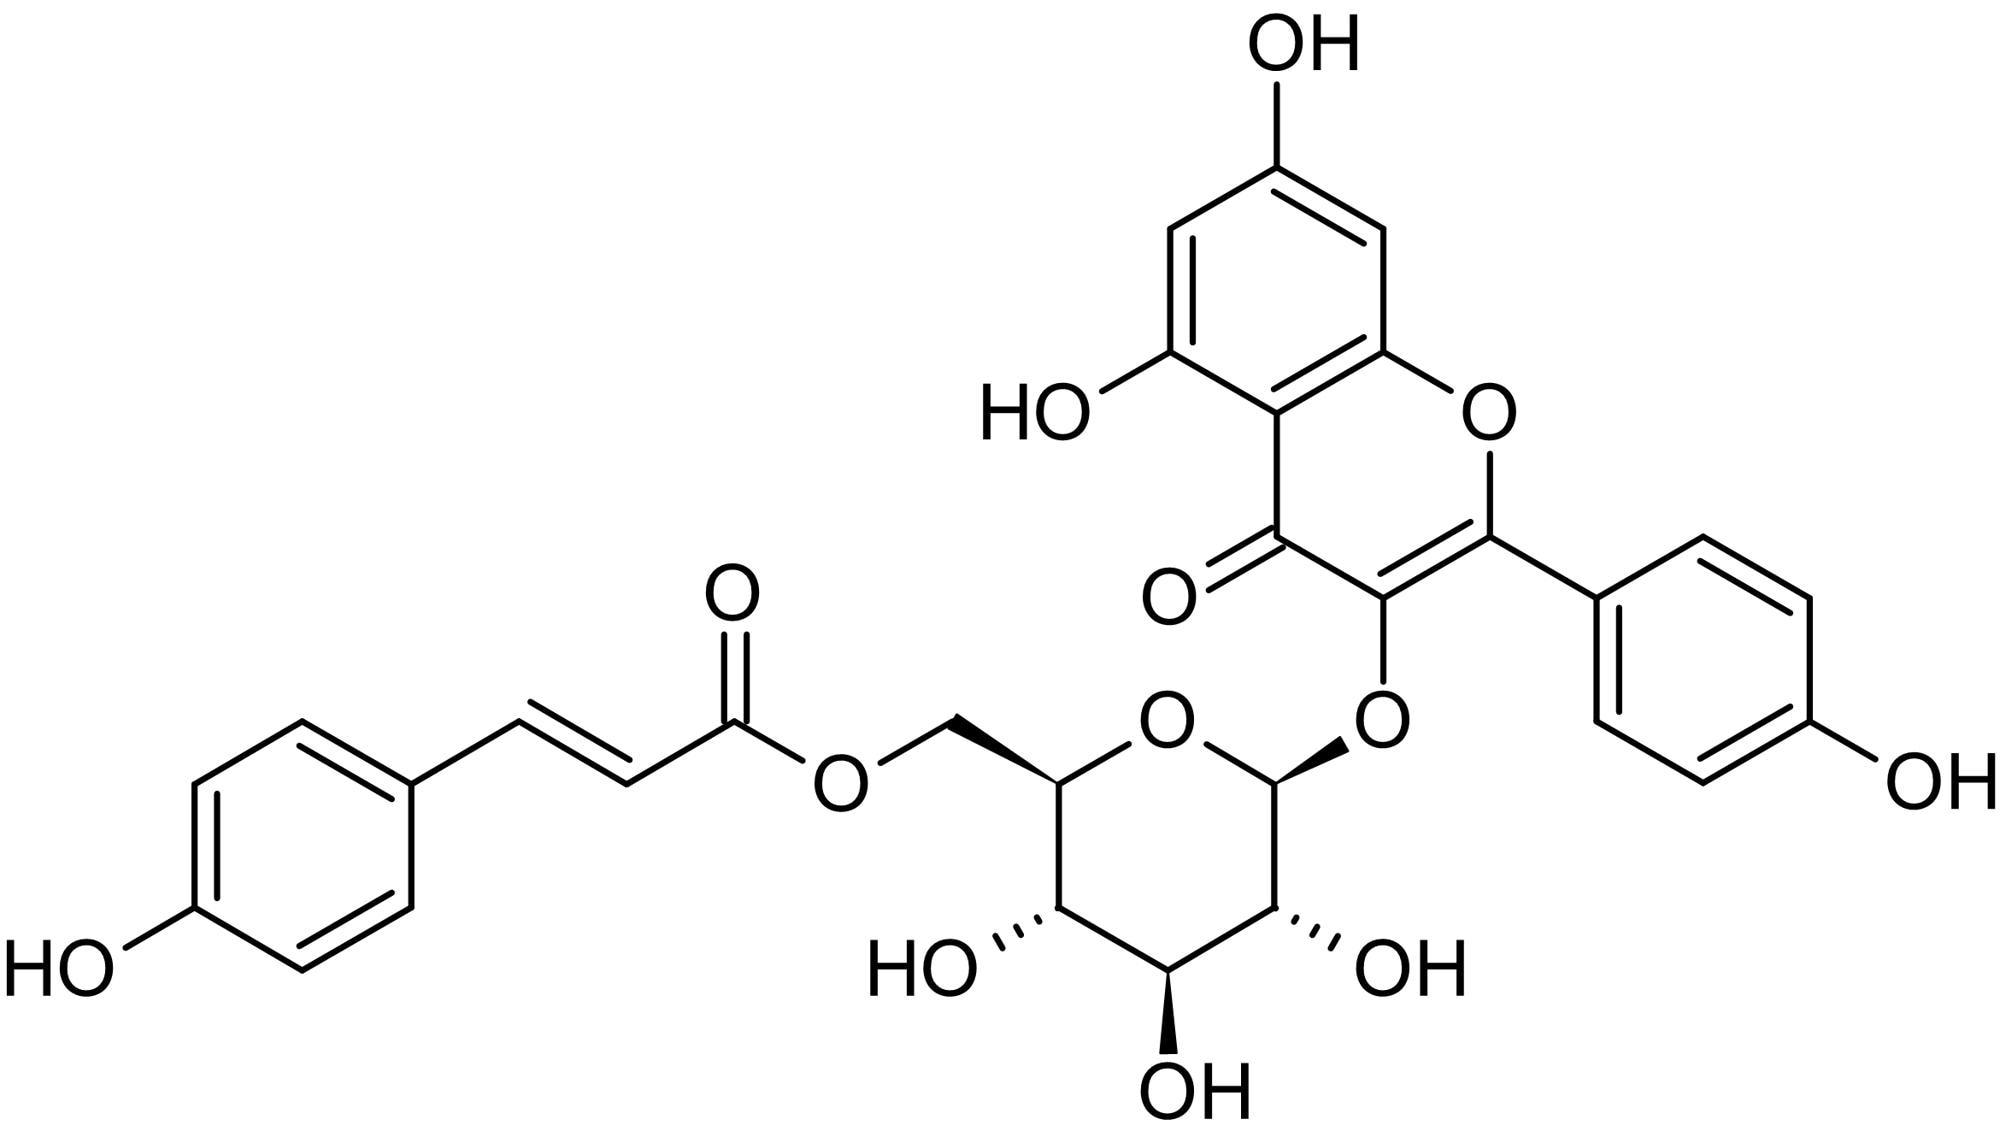 Chemical Structure - Tiliroside, CYP inhibitor (ab141455)